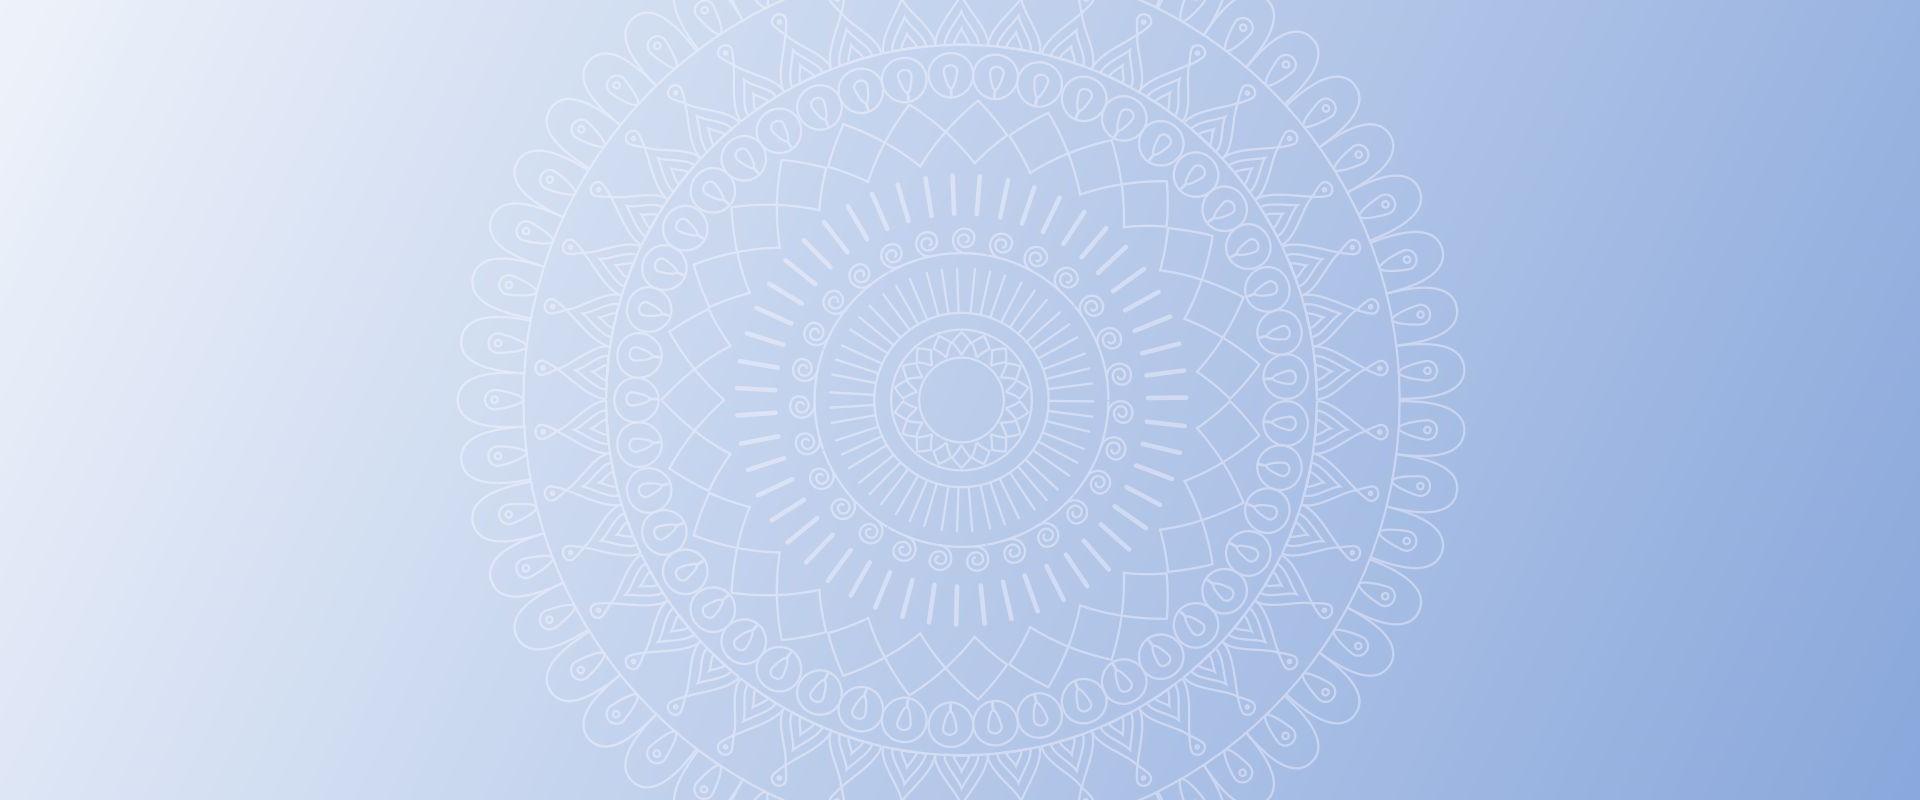 dorit-bull-guestrow-yoga-studio-leistungen-mandala-blue